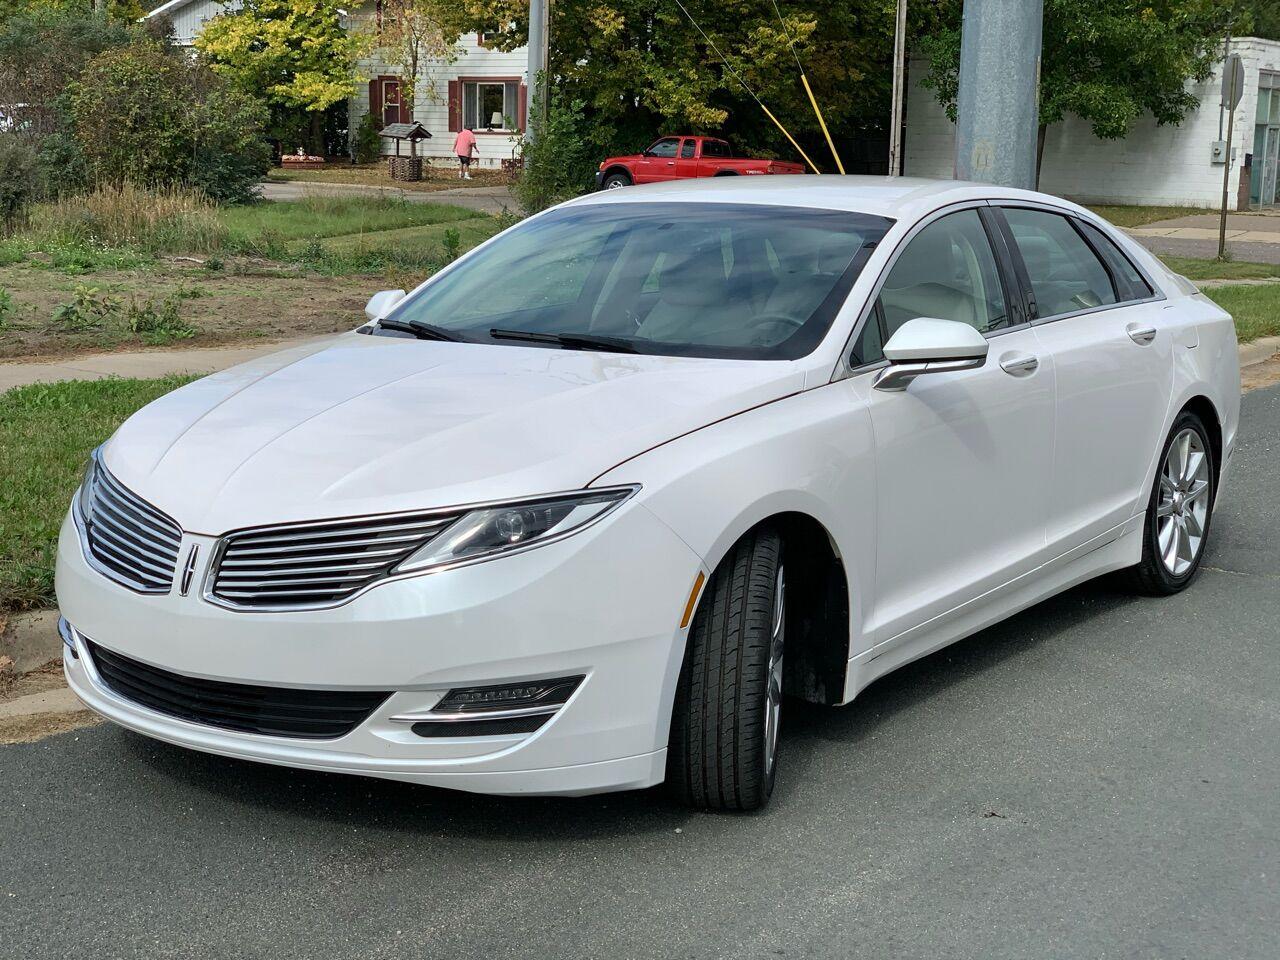 Used Lincoln Mkz Hybrid For Sale In Jordan Mn Carsforsale Com